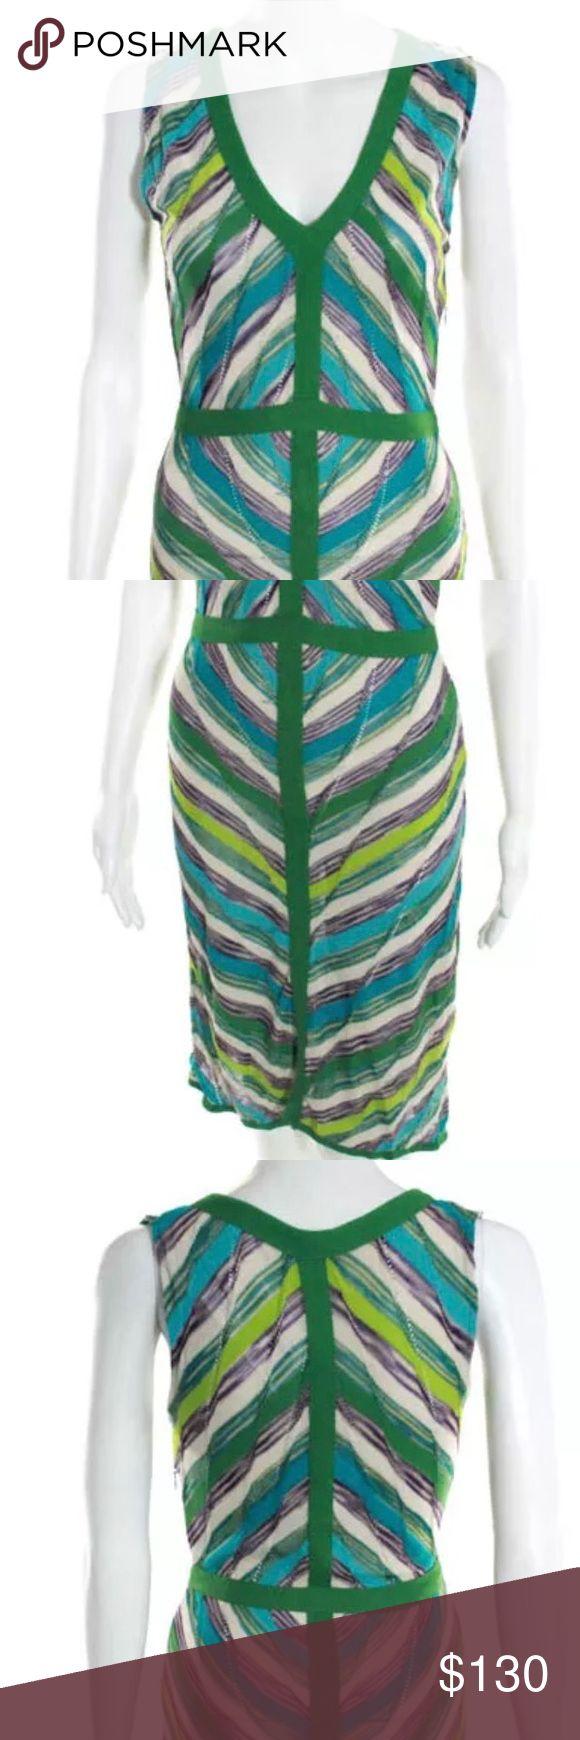 M Missoni Dress Green Multi Colored Striped V Neck Sheath Dress M Missoni Dresses